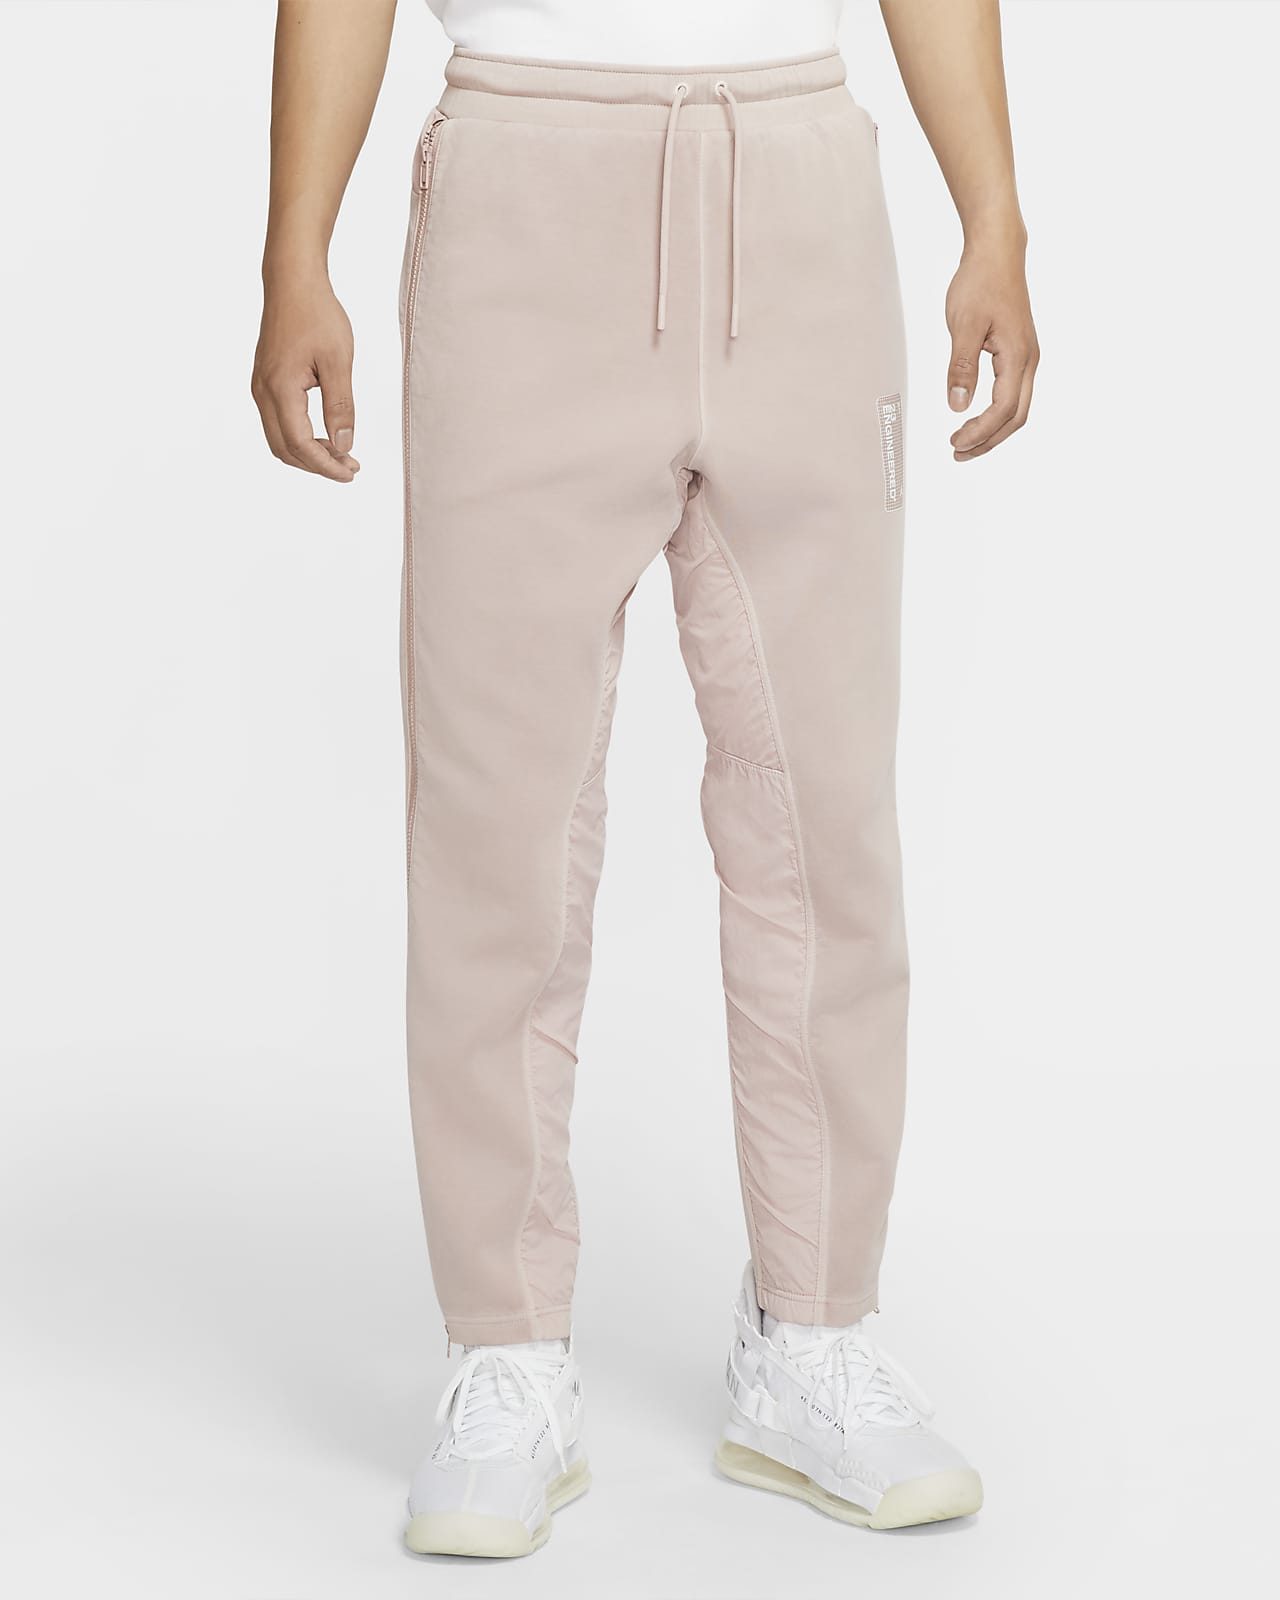 Pantalones De Tejido Fleece Para Hombre Jordan 23 Engineered Nike Com